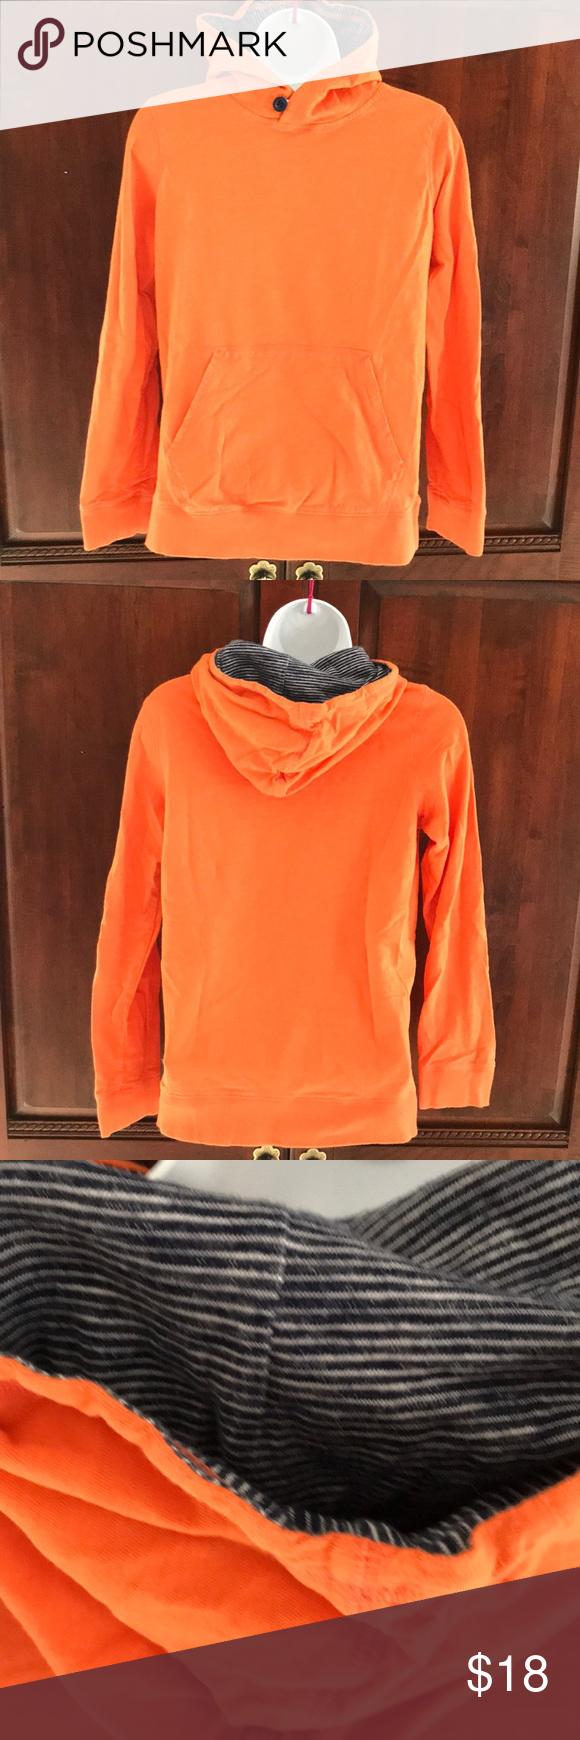 Lands End Boys Hoodie T Shirt Size L 14 16 Boys Hoodies Long Sleeve Tshirt Men Shirt Size [ 1740 x 580 Pixel ]